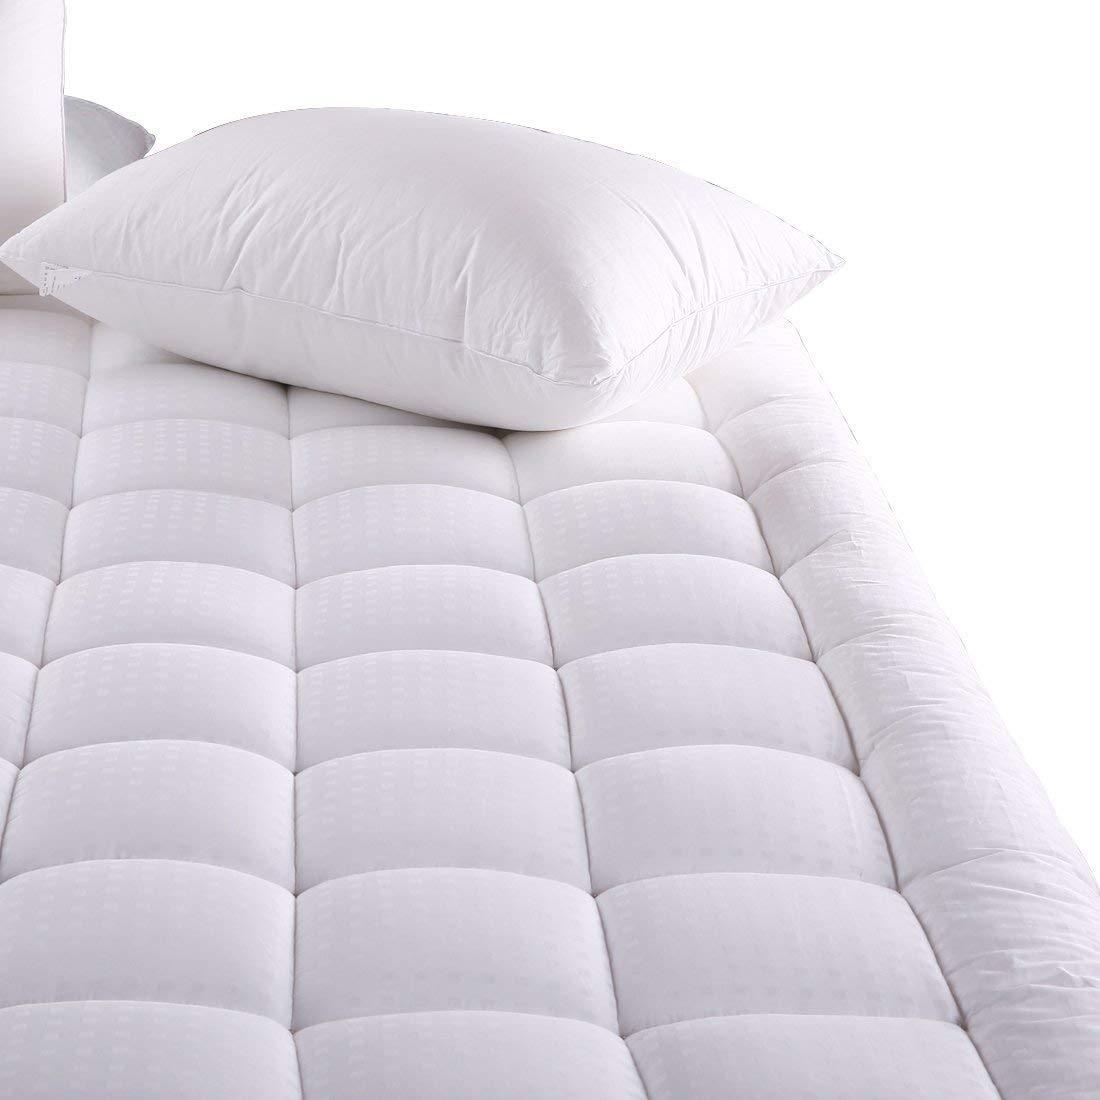 MEROUS Queen Size Cotton Mattress Pad - Pillow Top Quilted Mattress Topper,Fitted 18 Inch Deep Pocket Mattress Pad Cover